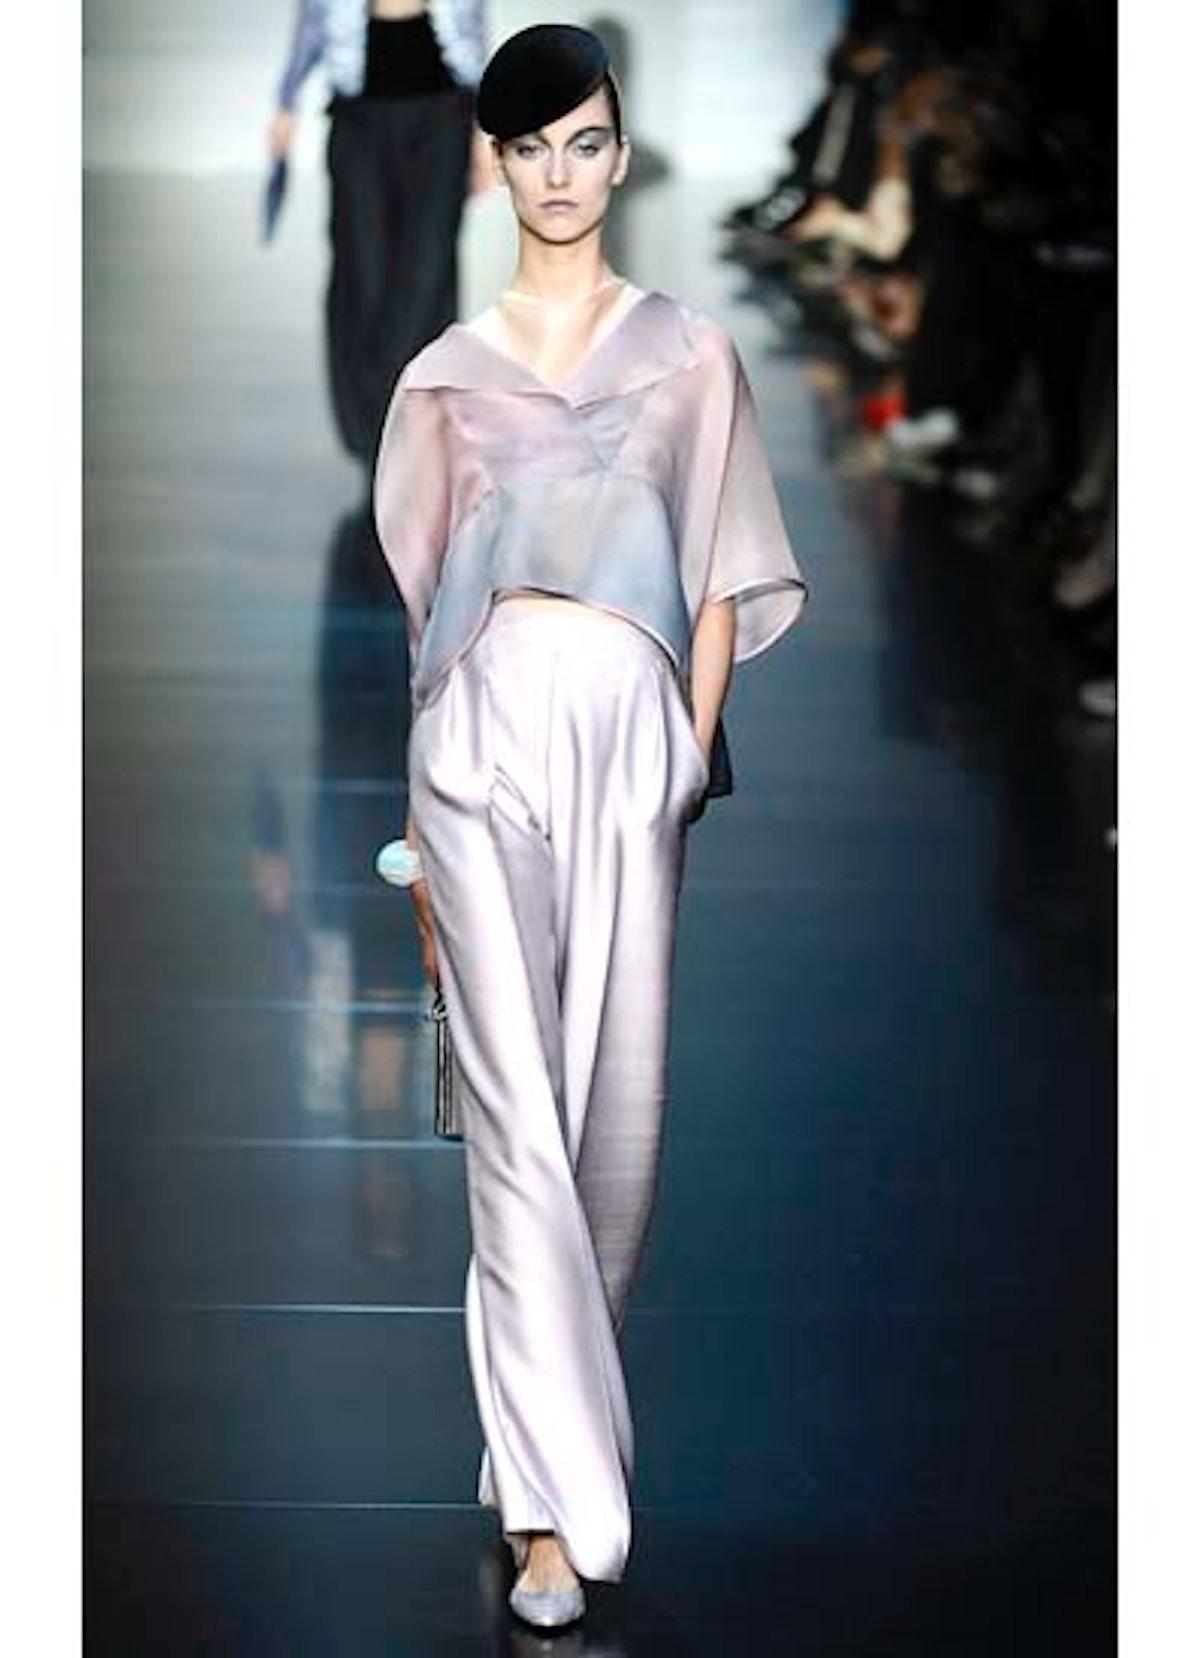 fass-giorgio-armani-couture-2012-runway-16-v.jpg